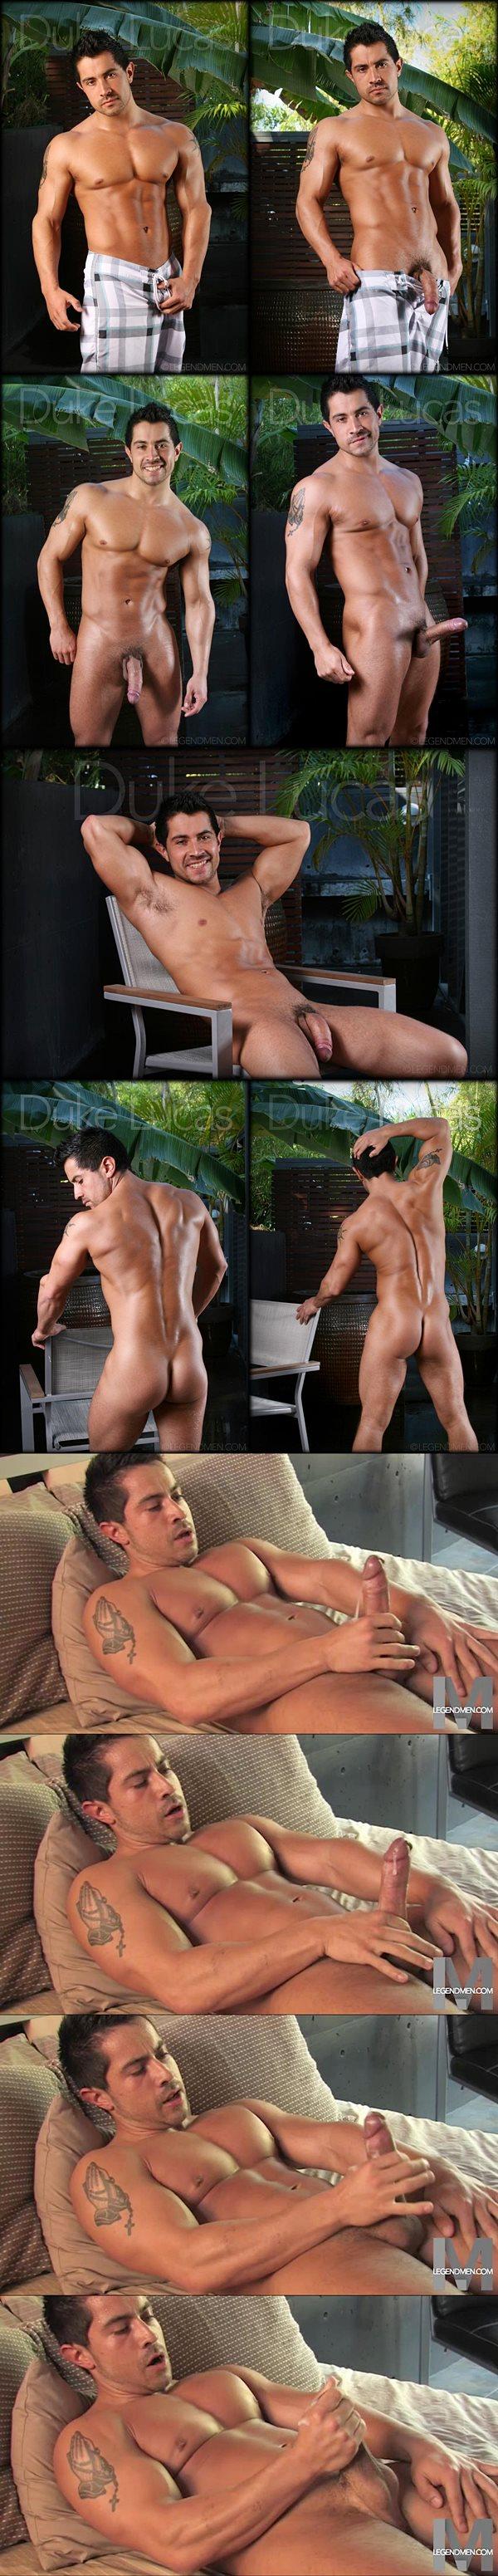 Big-dicked muscle hunk Duke Lucas shoots his hot cum at Legendmen